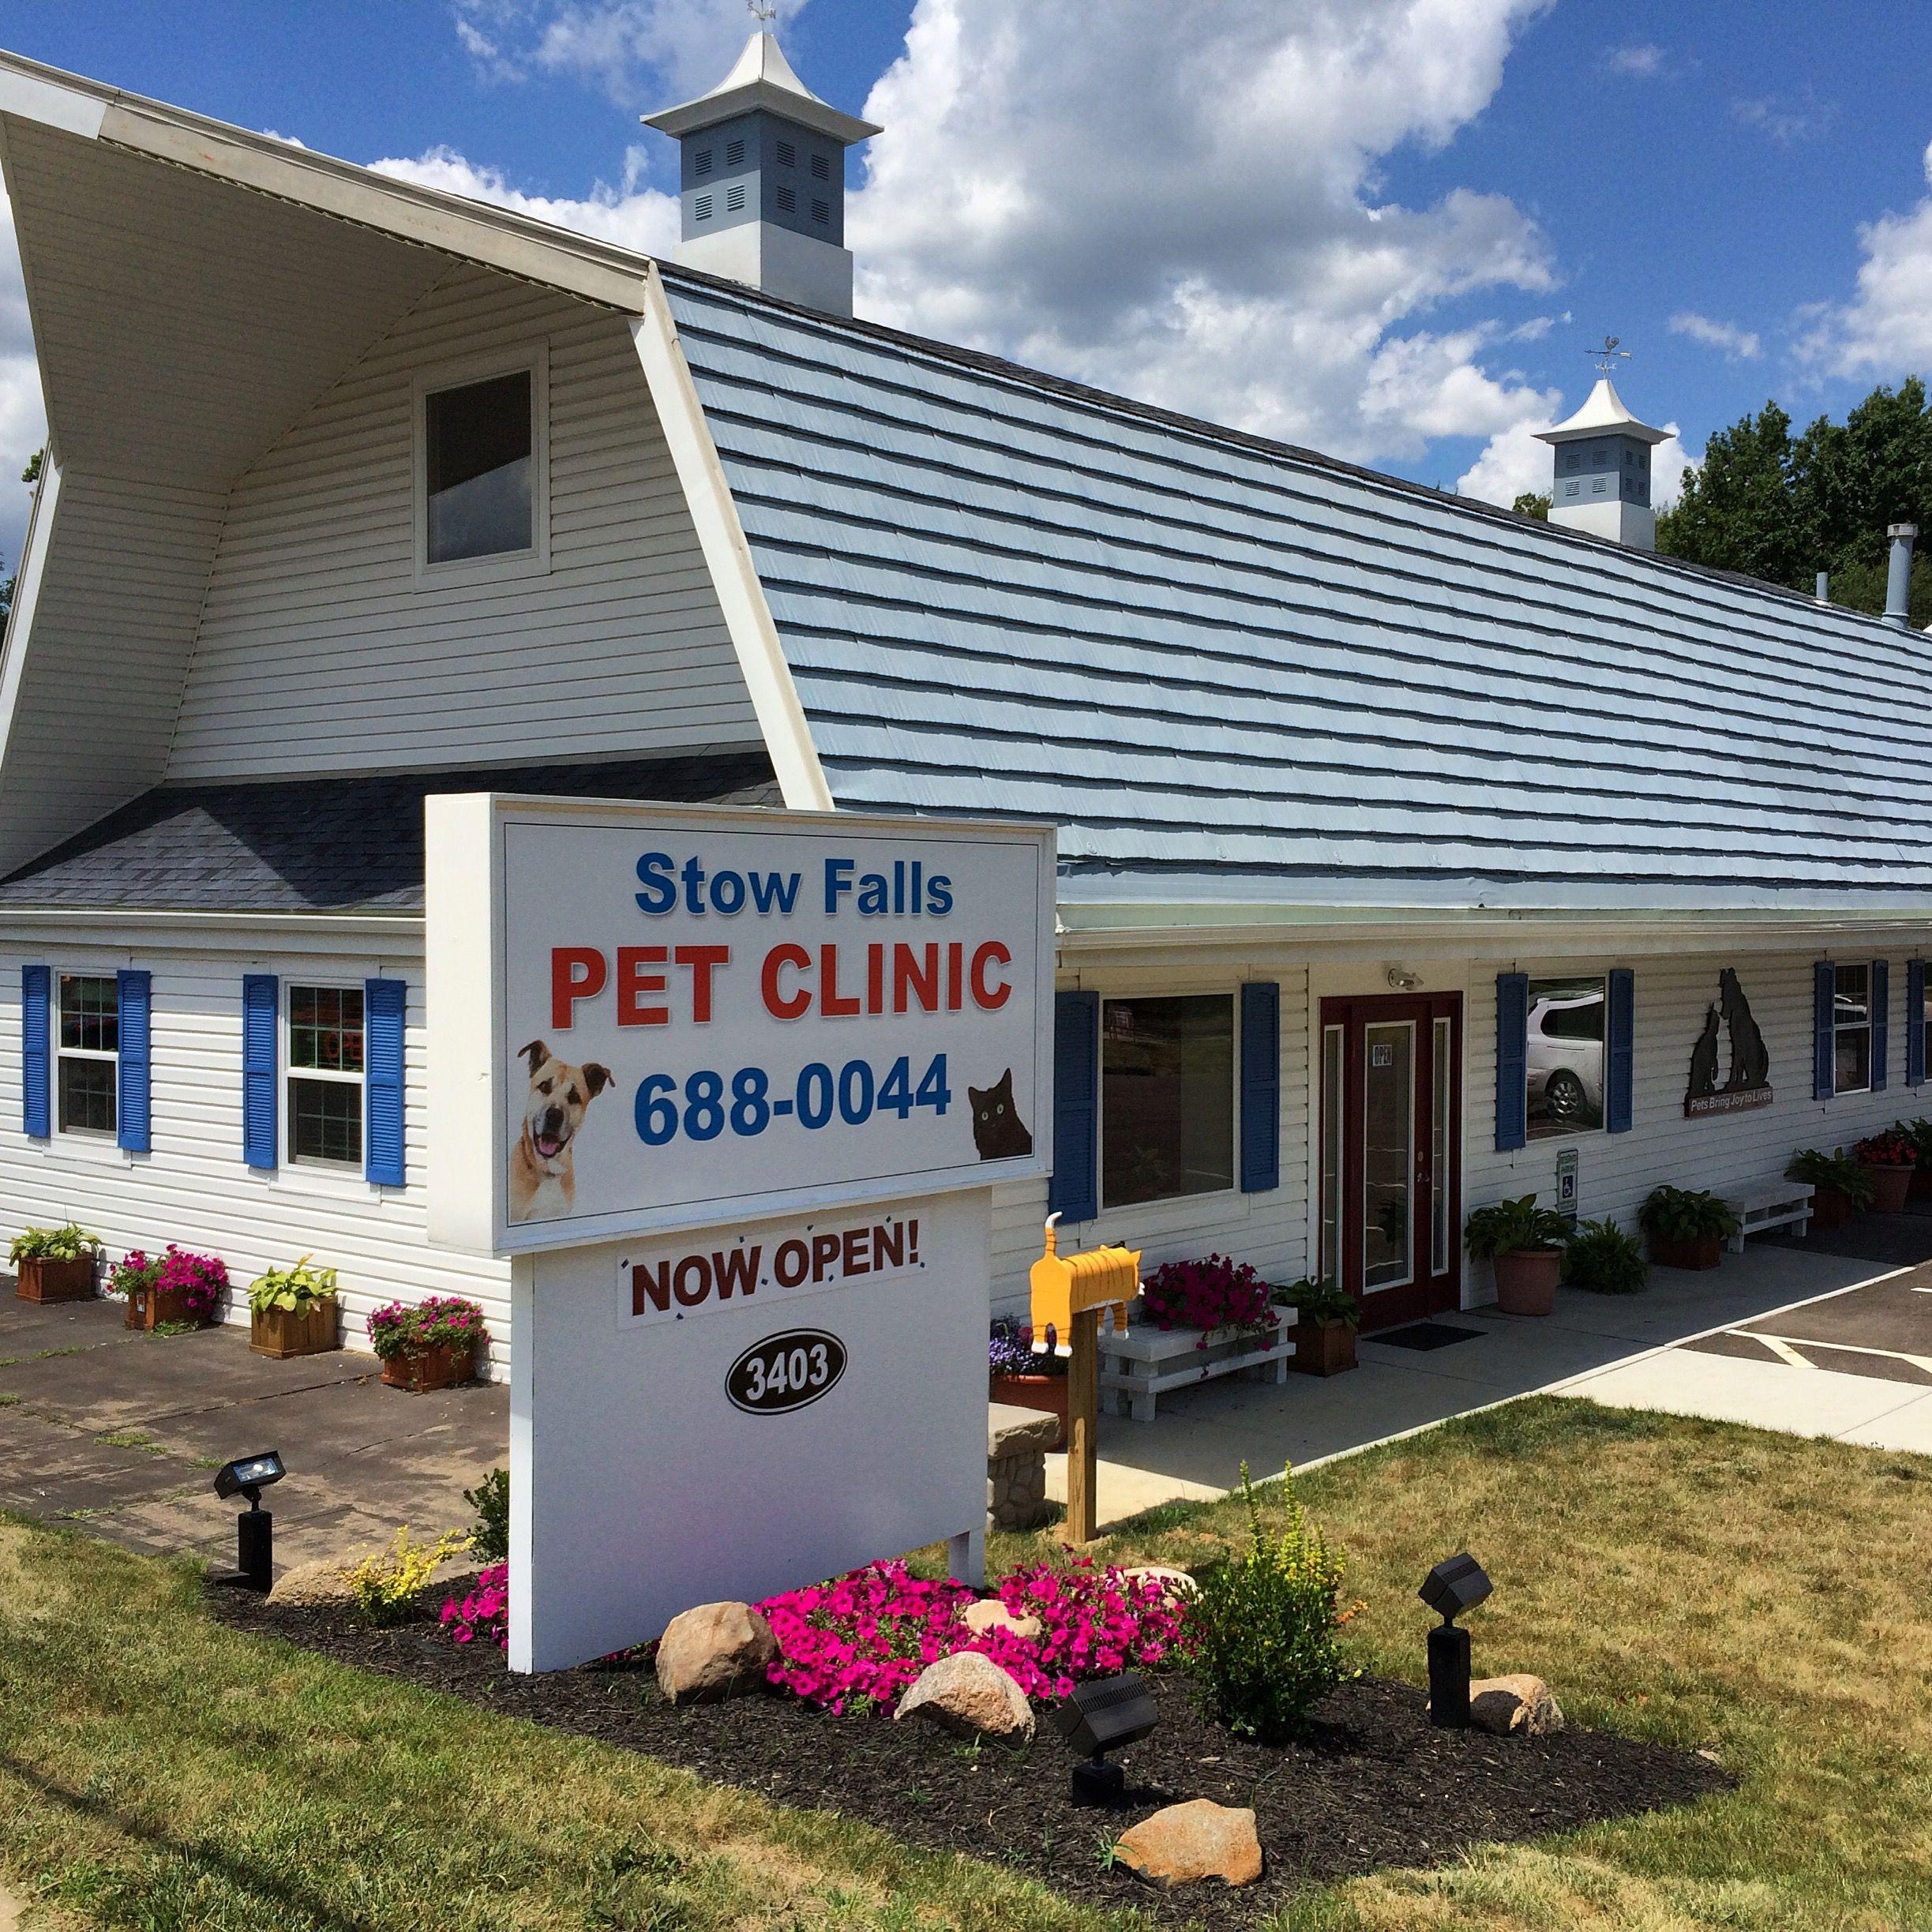 Stow Falls Pet Clinic 3403 Kent Road Stow Ohio 44224 Smallanimalvet Pet Clinic Animal Hospital Pet Vet